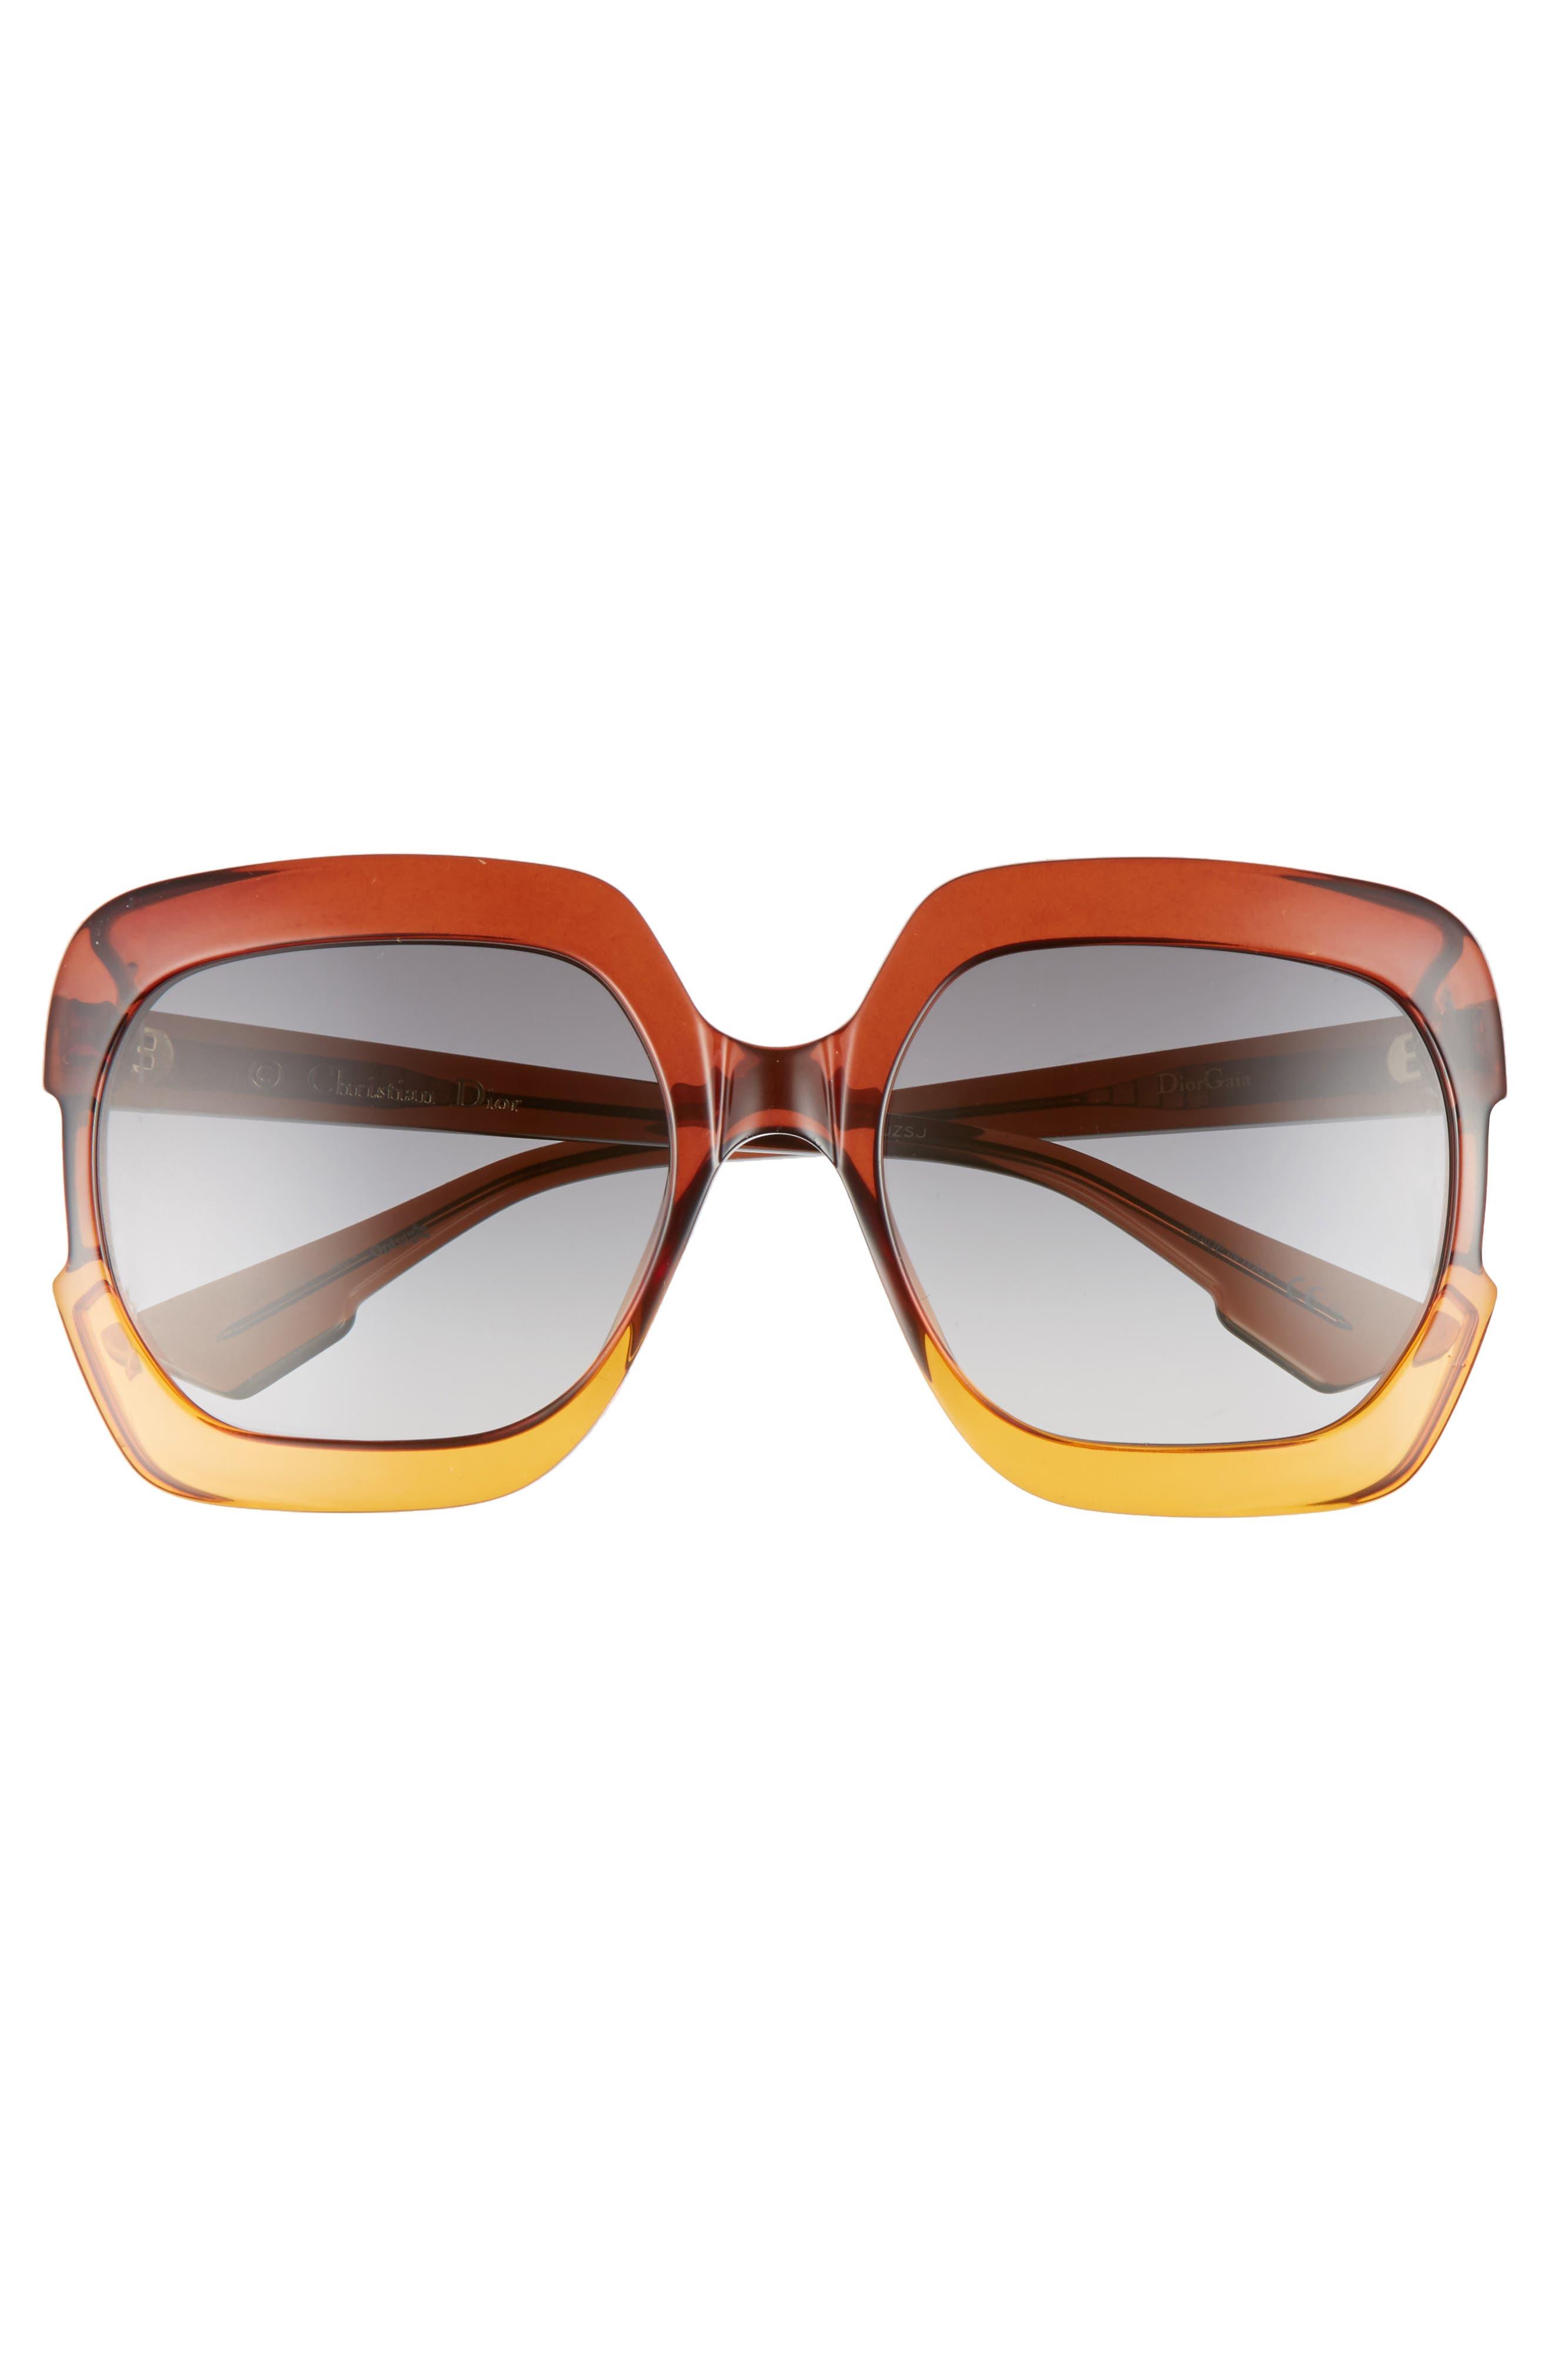 Gaia 58mm Square Sunglasses,                             Alternate thumbnail 3, color,                             Brown/ Orange